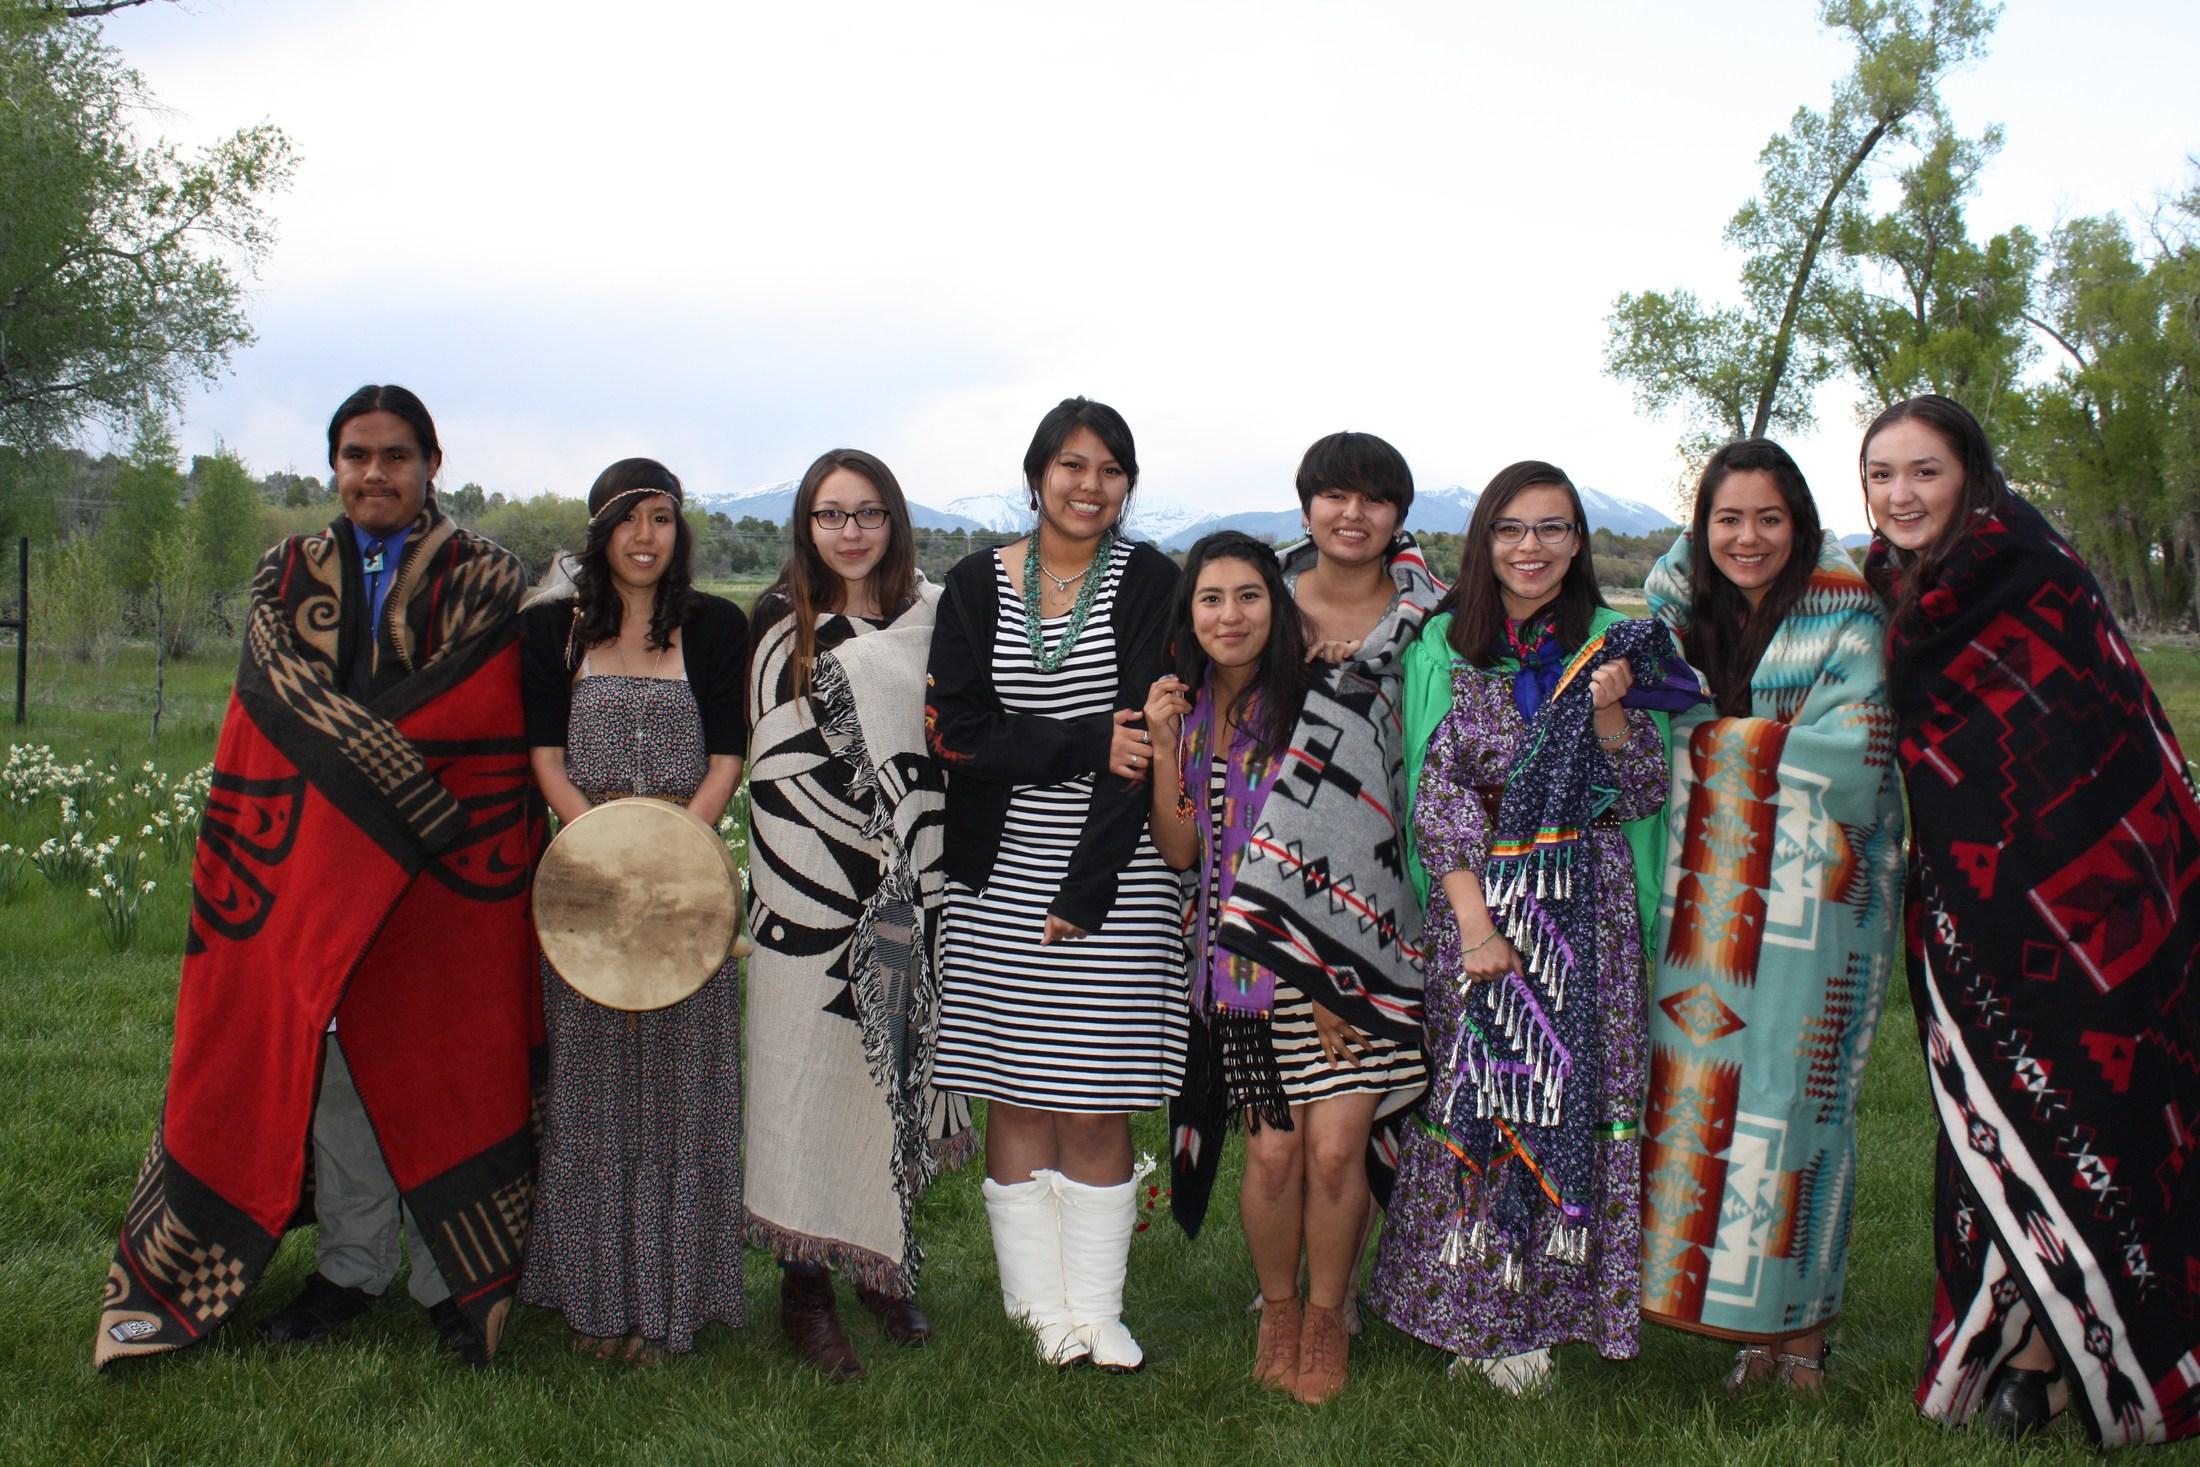 Graduates at the Title VI Native American Graduation Celebration.